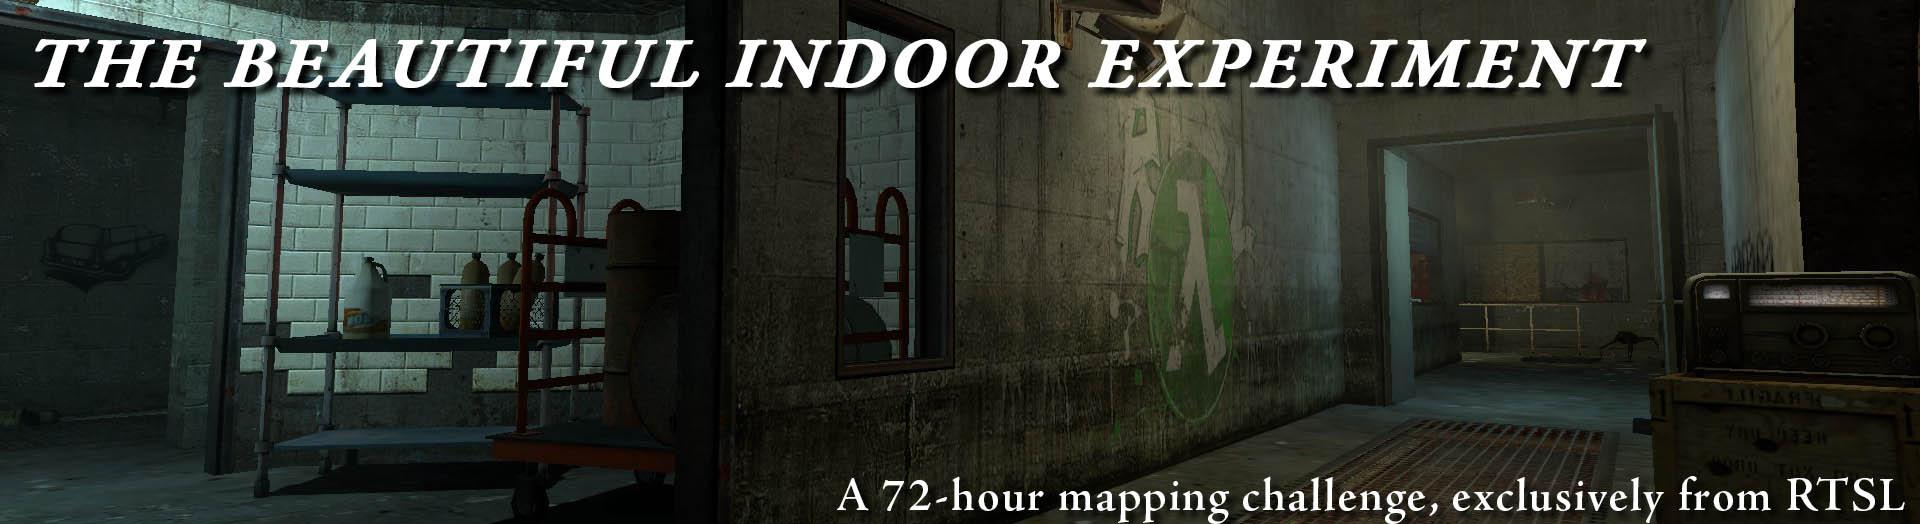 The Beautiful Indoor Experiment